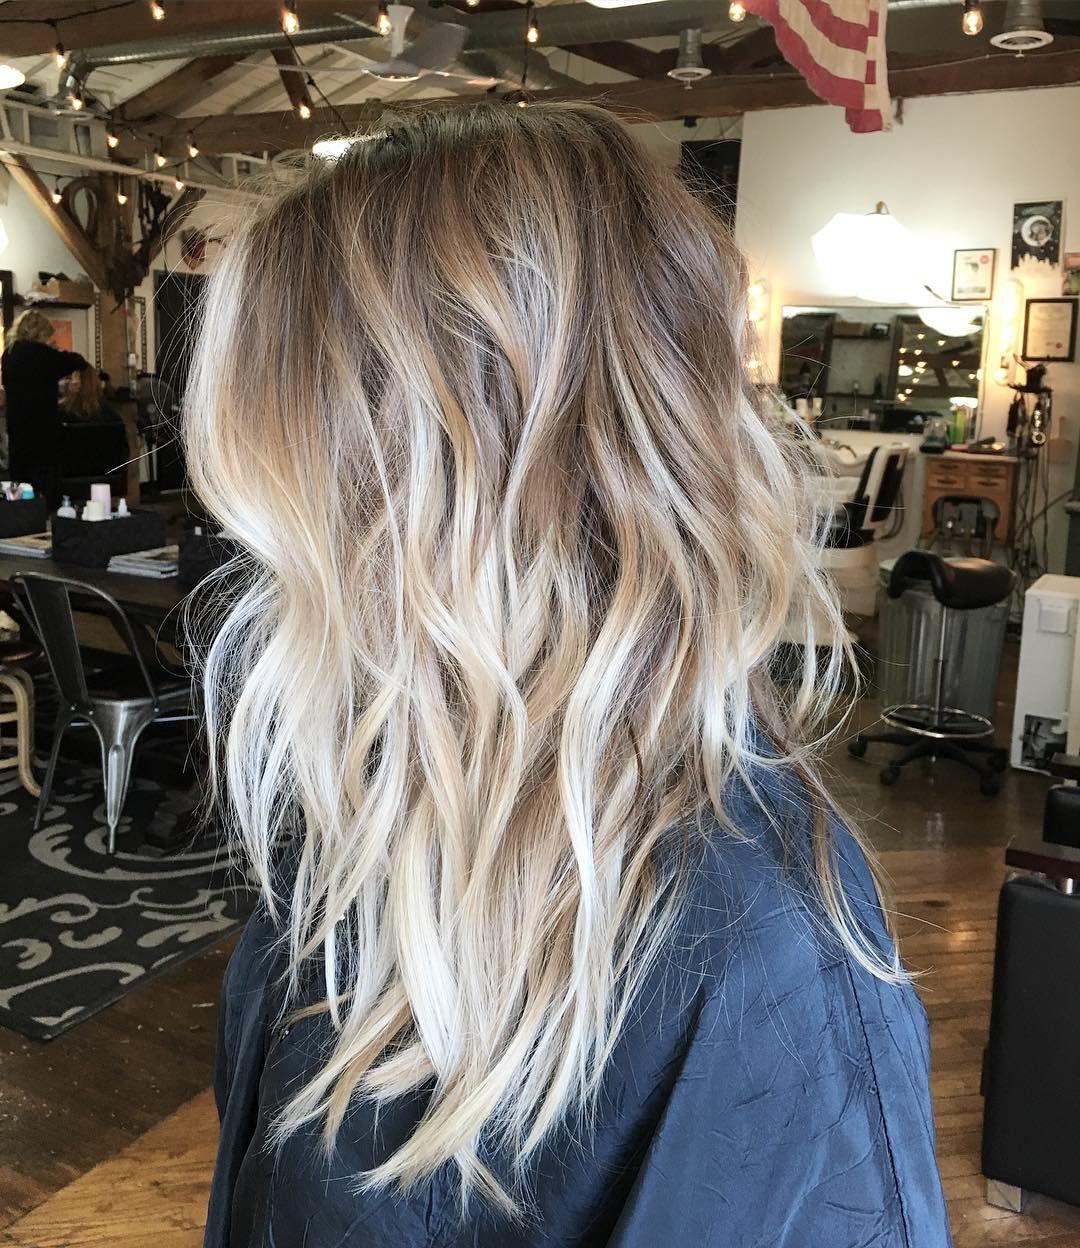 Blonde Hairstyles Winter 2017 Hair Color Hair Styles